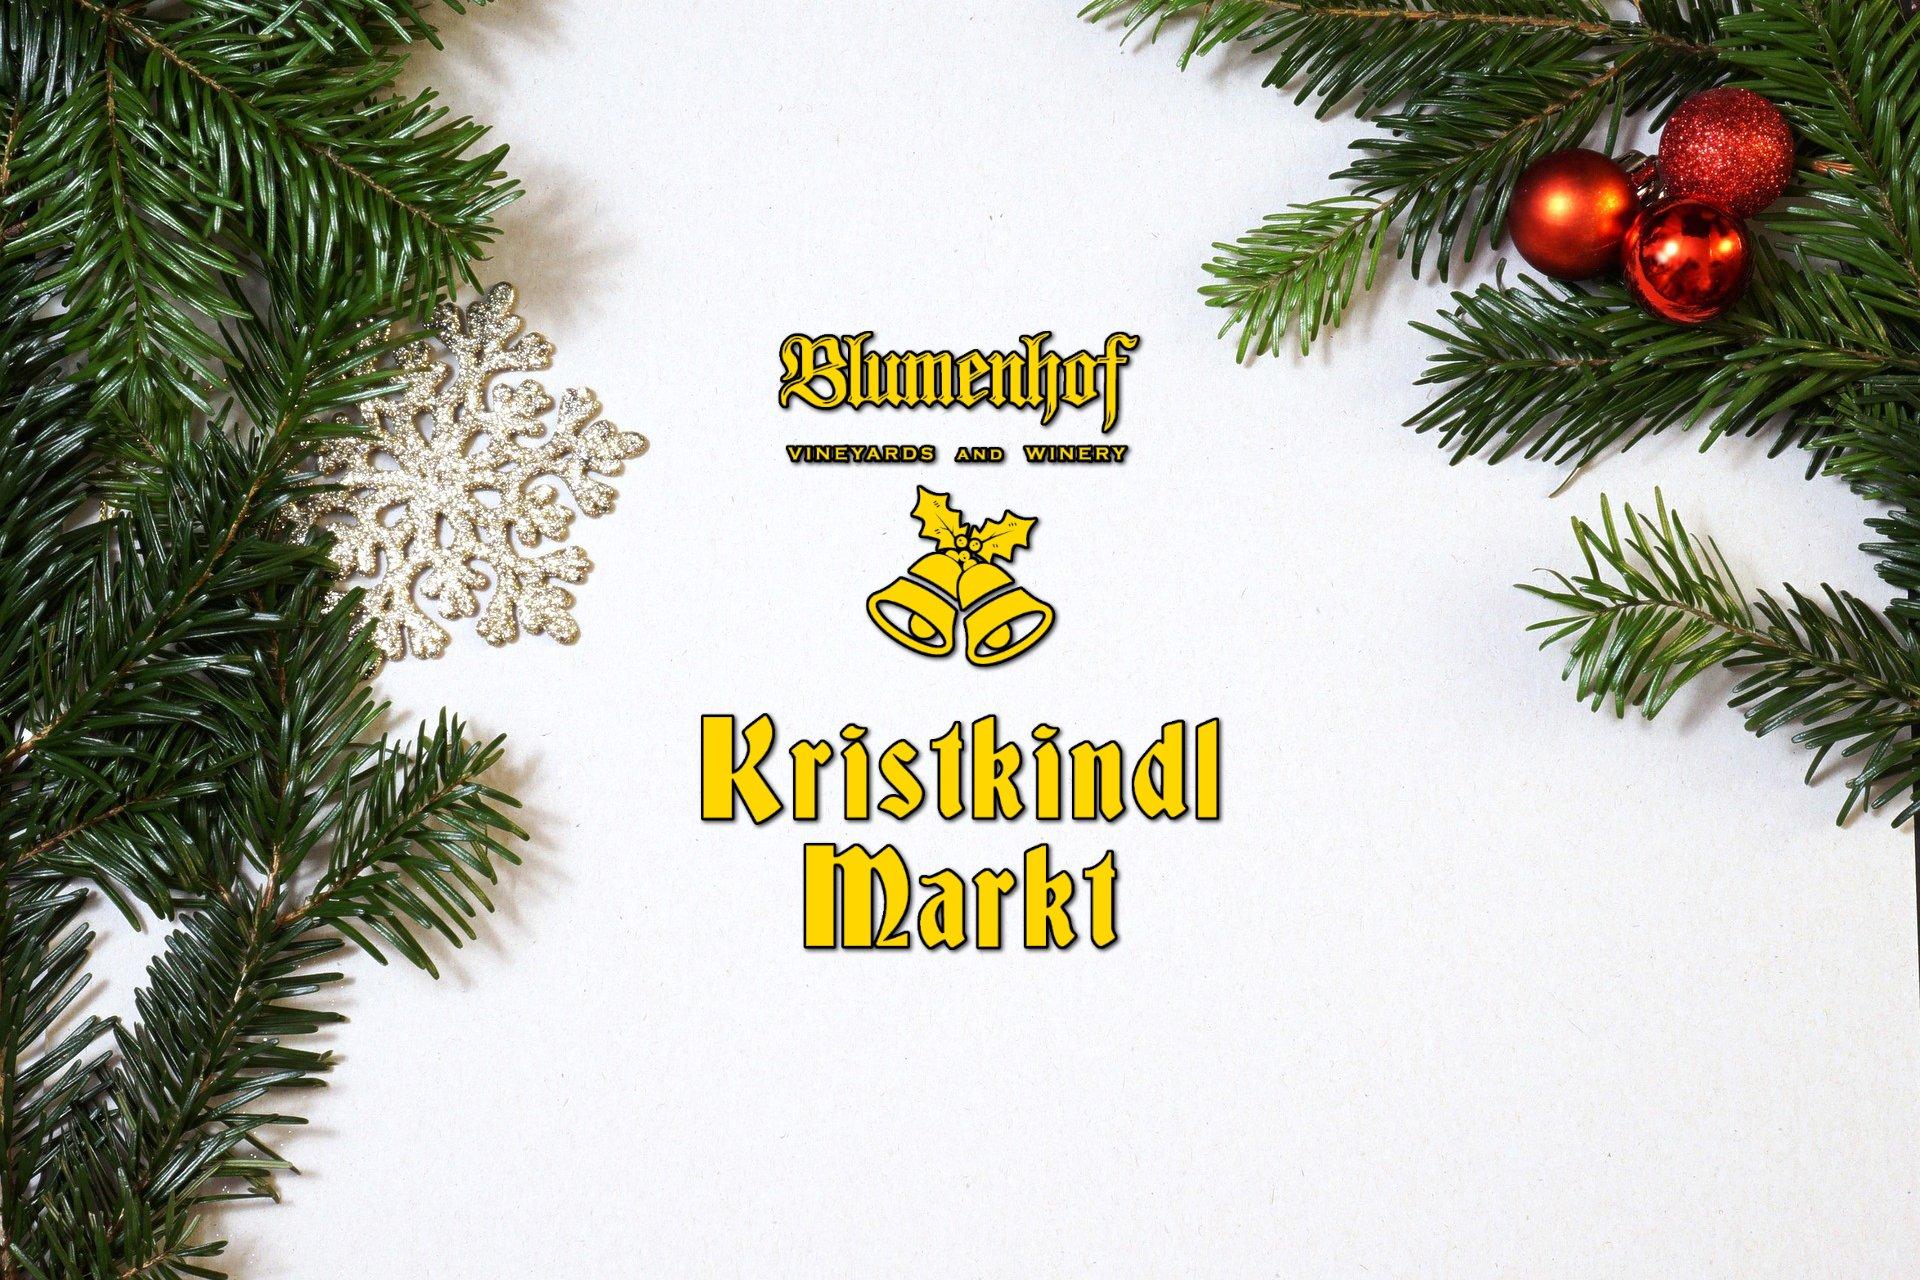 Kristkindl Markt at Blumenhof Winery 2018